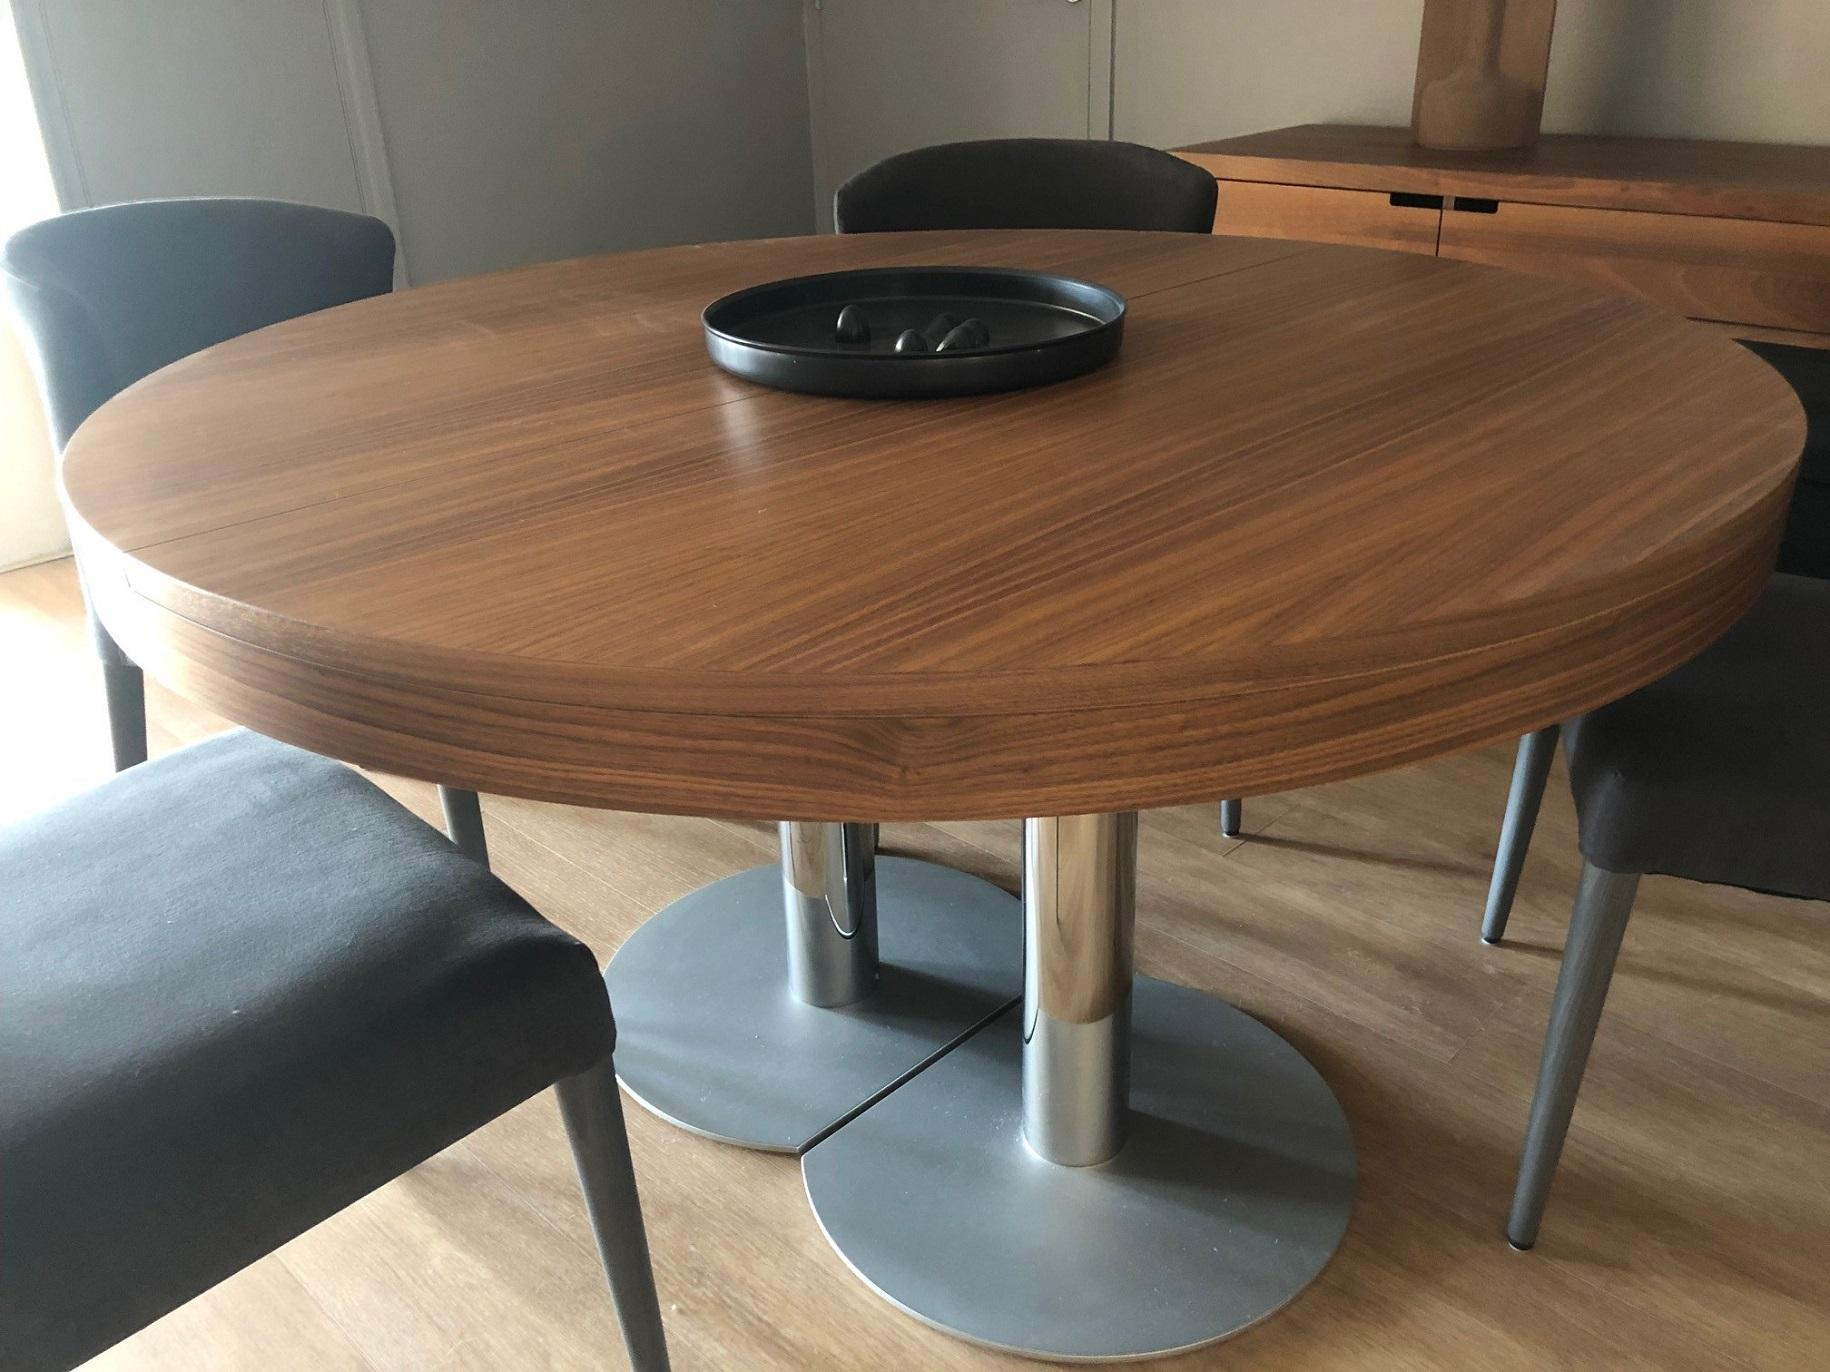 TABLE RONDE CRAFT Ligne Roset